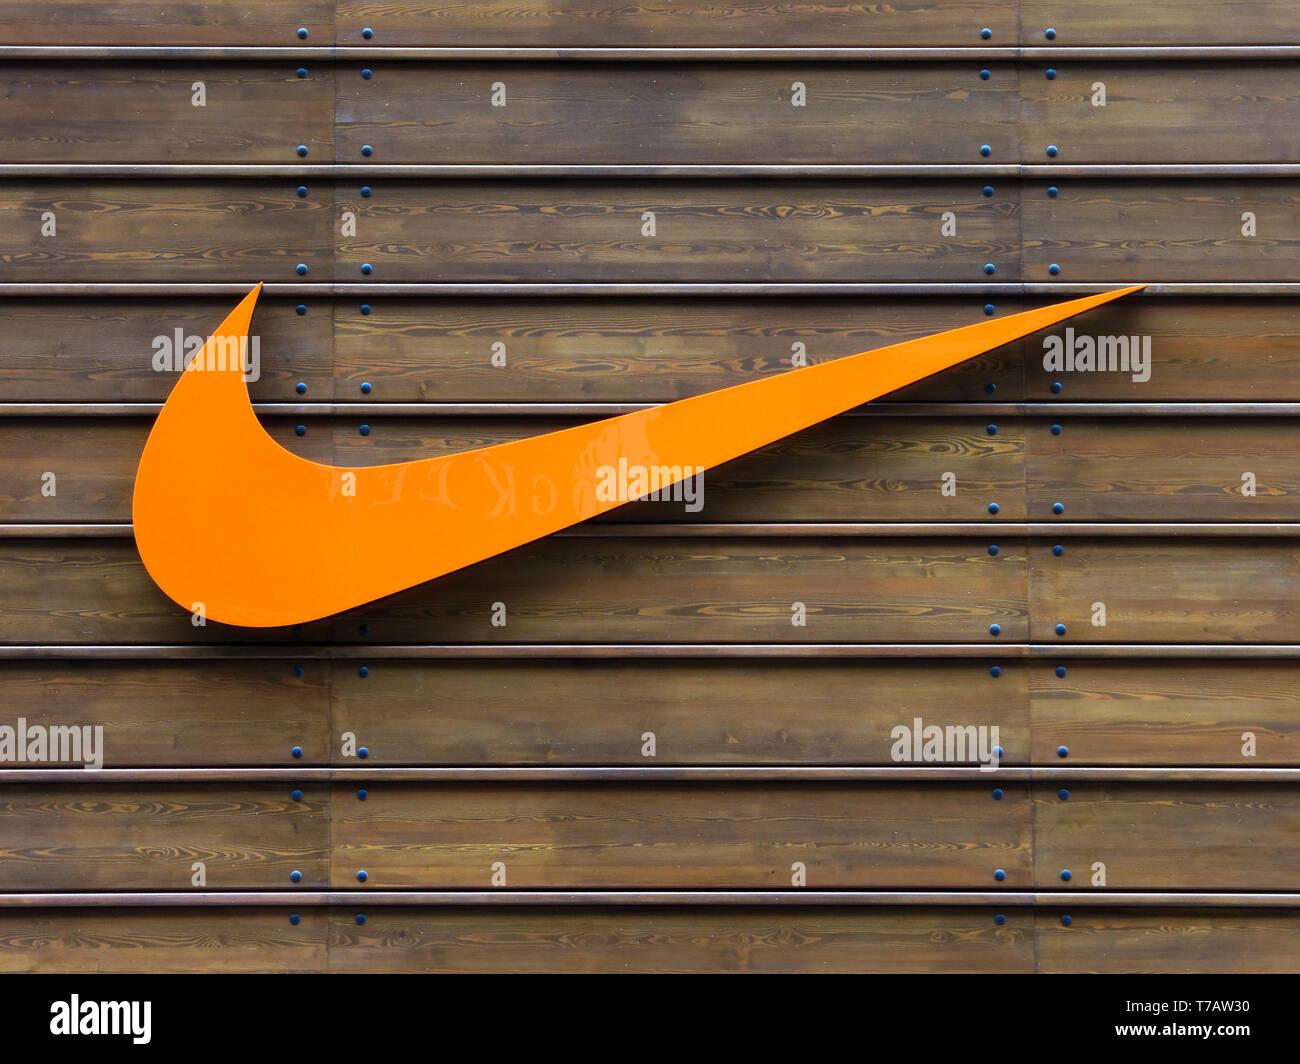 eaf48ce74e7d2 Nike Logo Sign Stock Photos   Nike Logo Sign Stock Images - Alamy